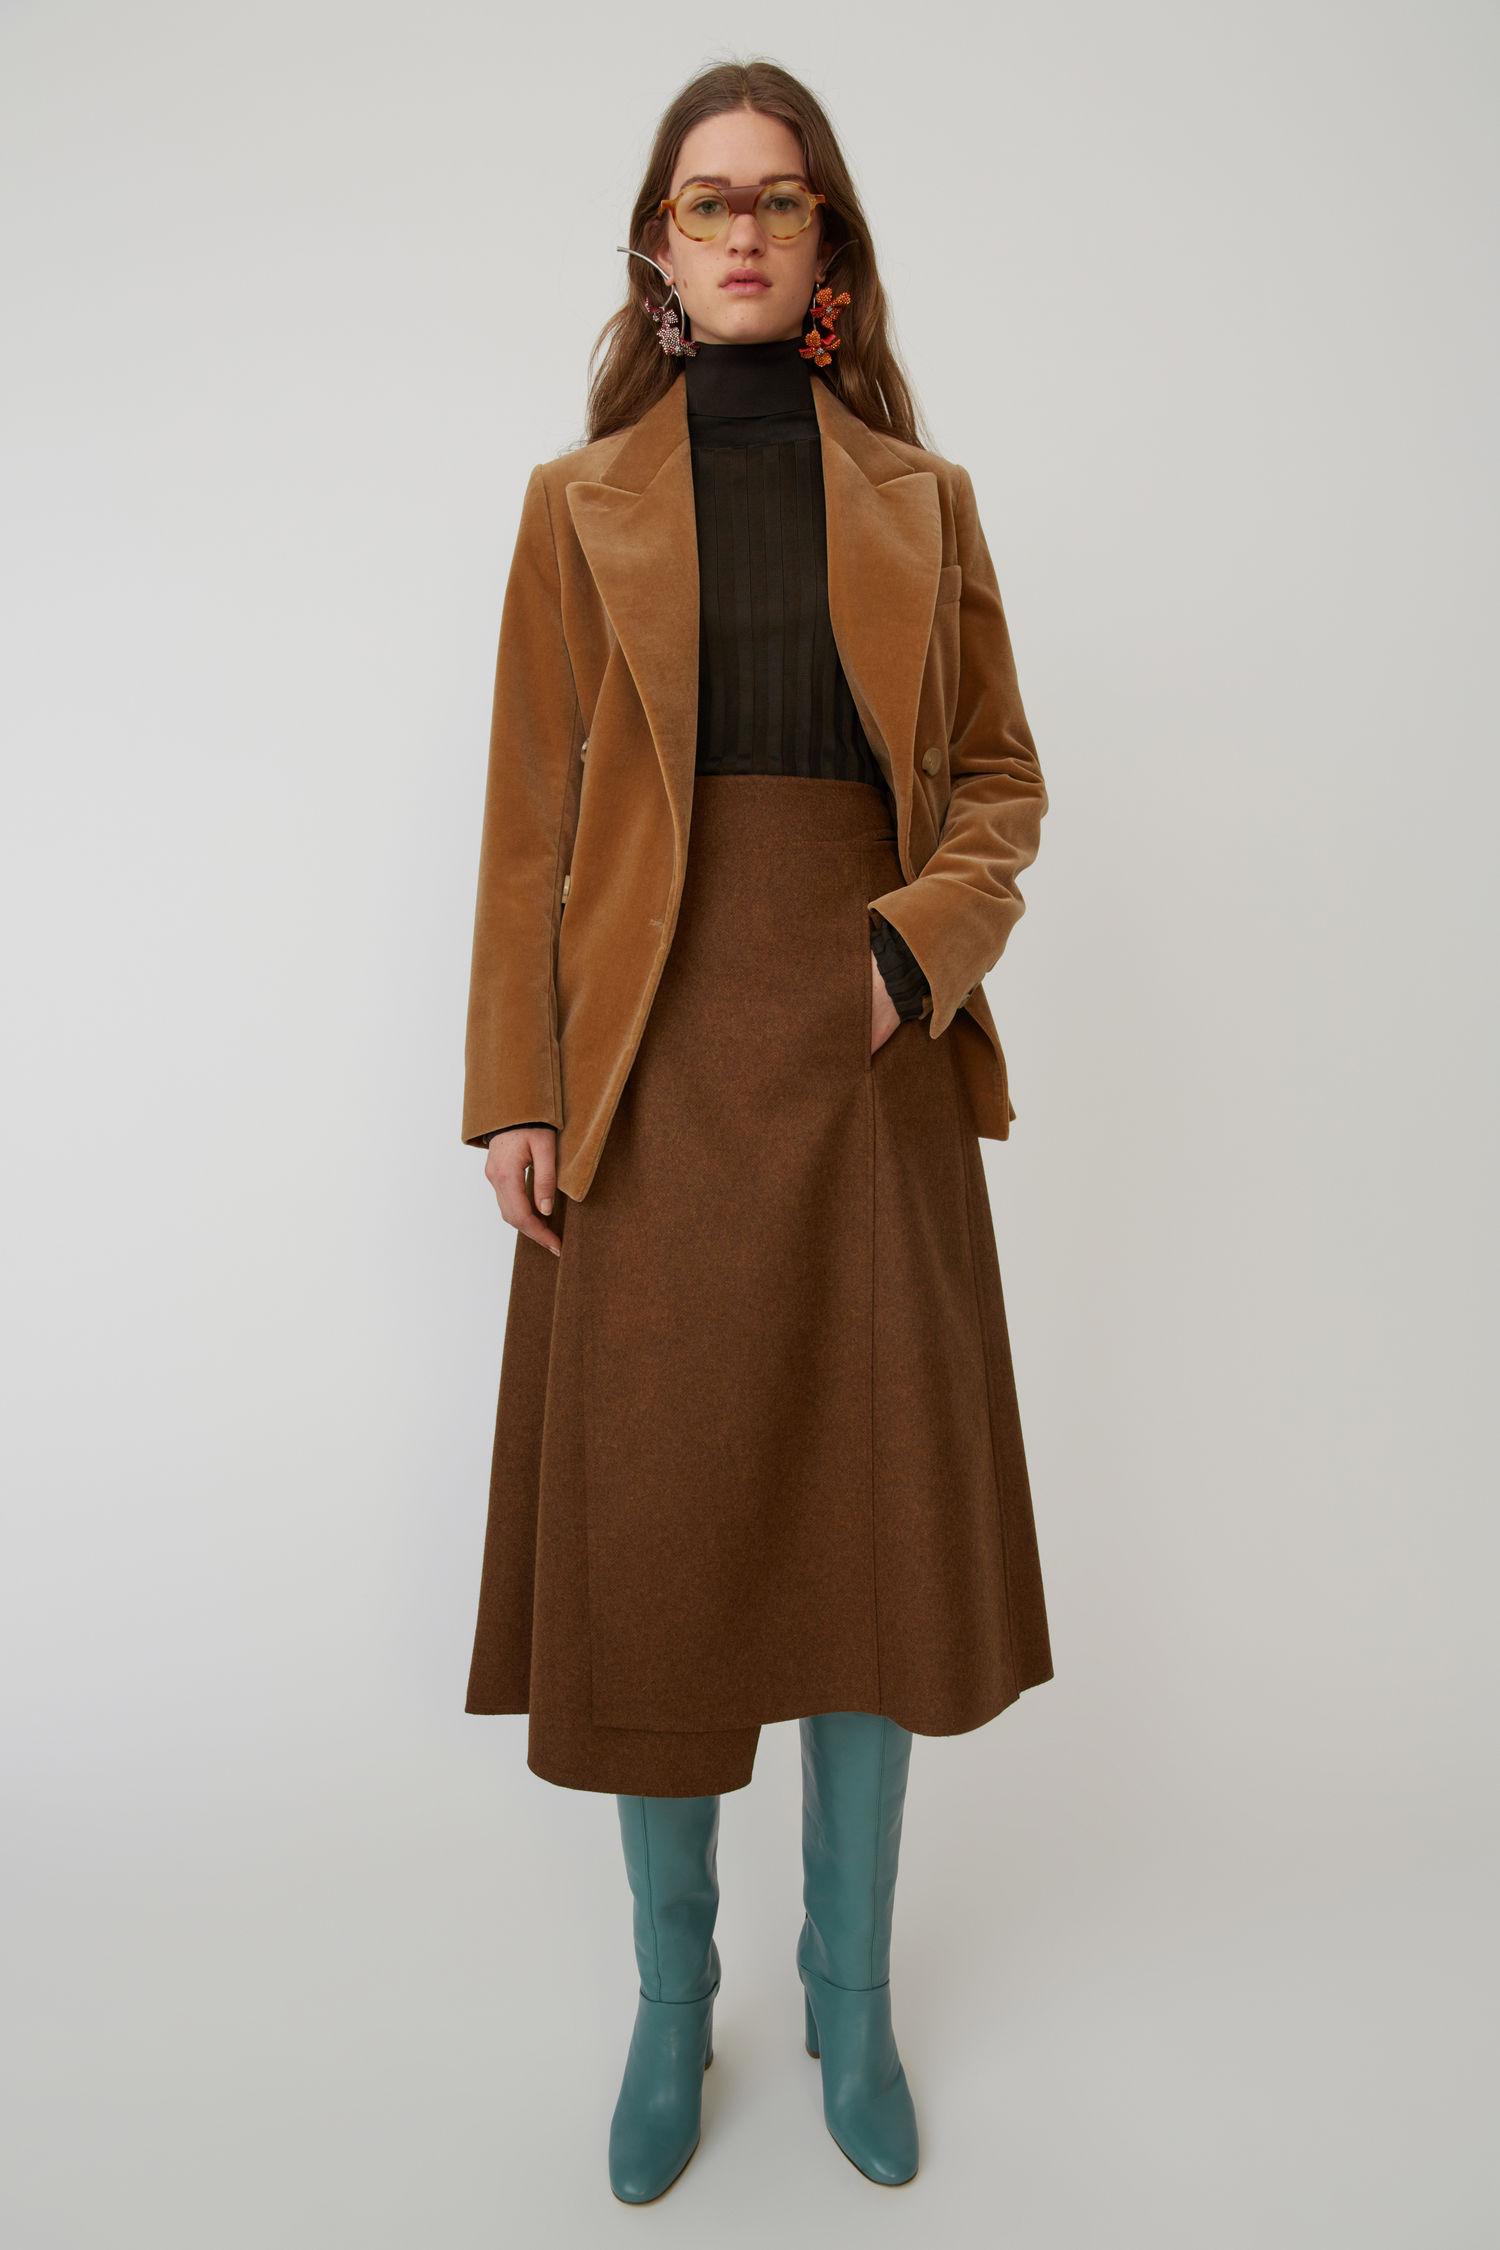 ACNE STUDIOS A-line wrap skirt caramel brown